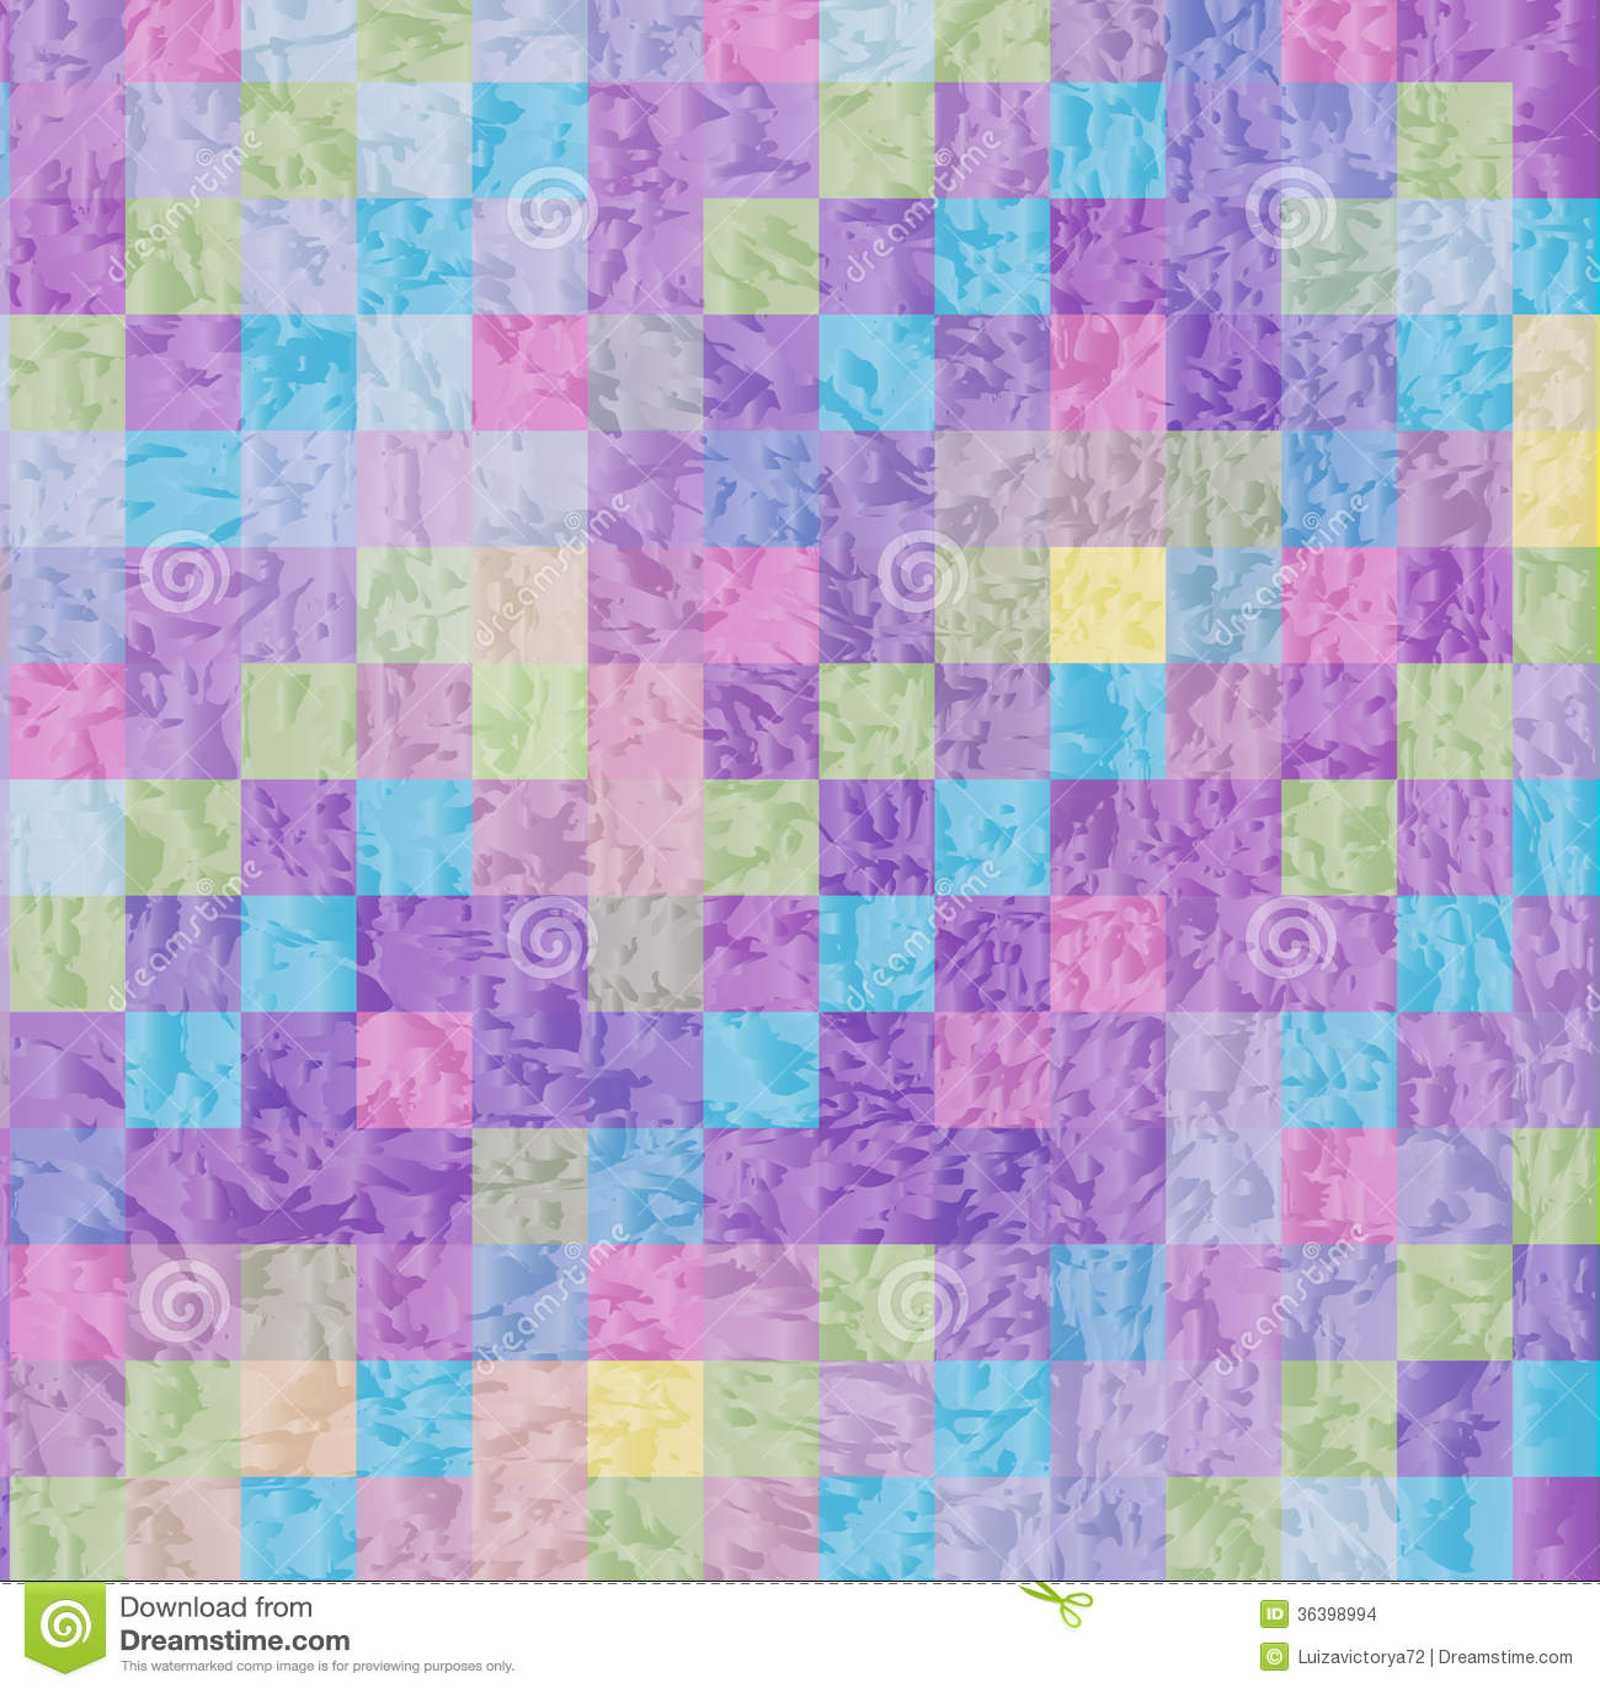 Mosaic Background For Design Cover Wallpaper Stock Illustration